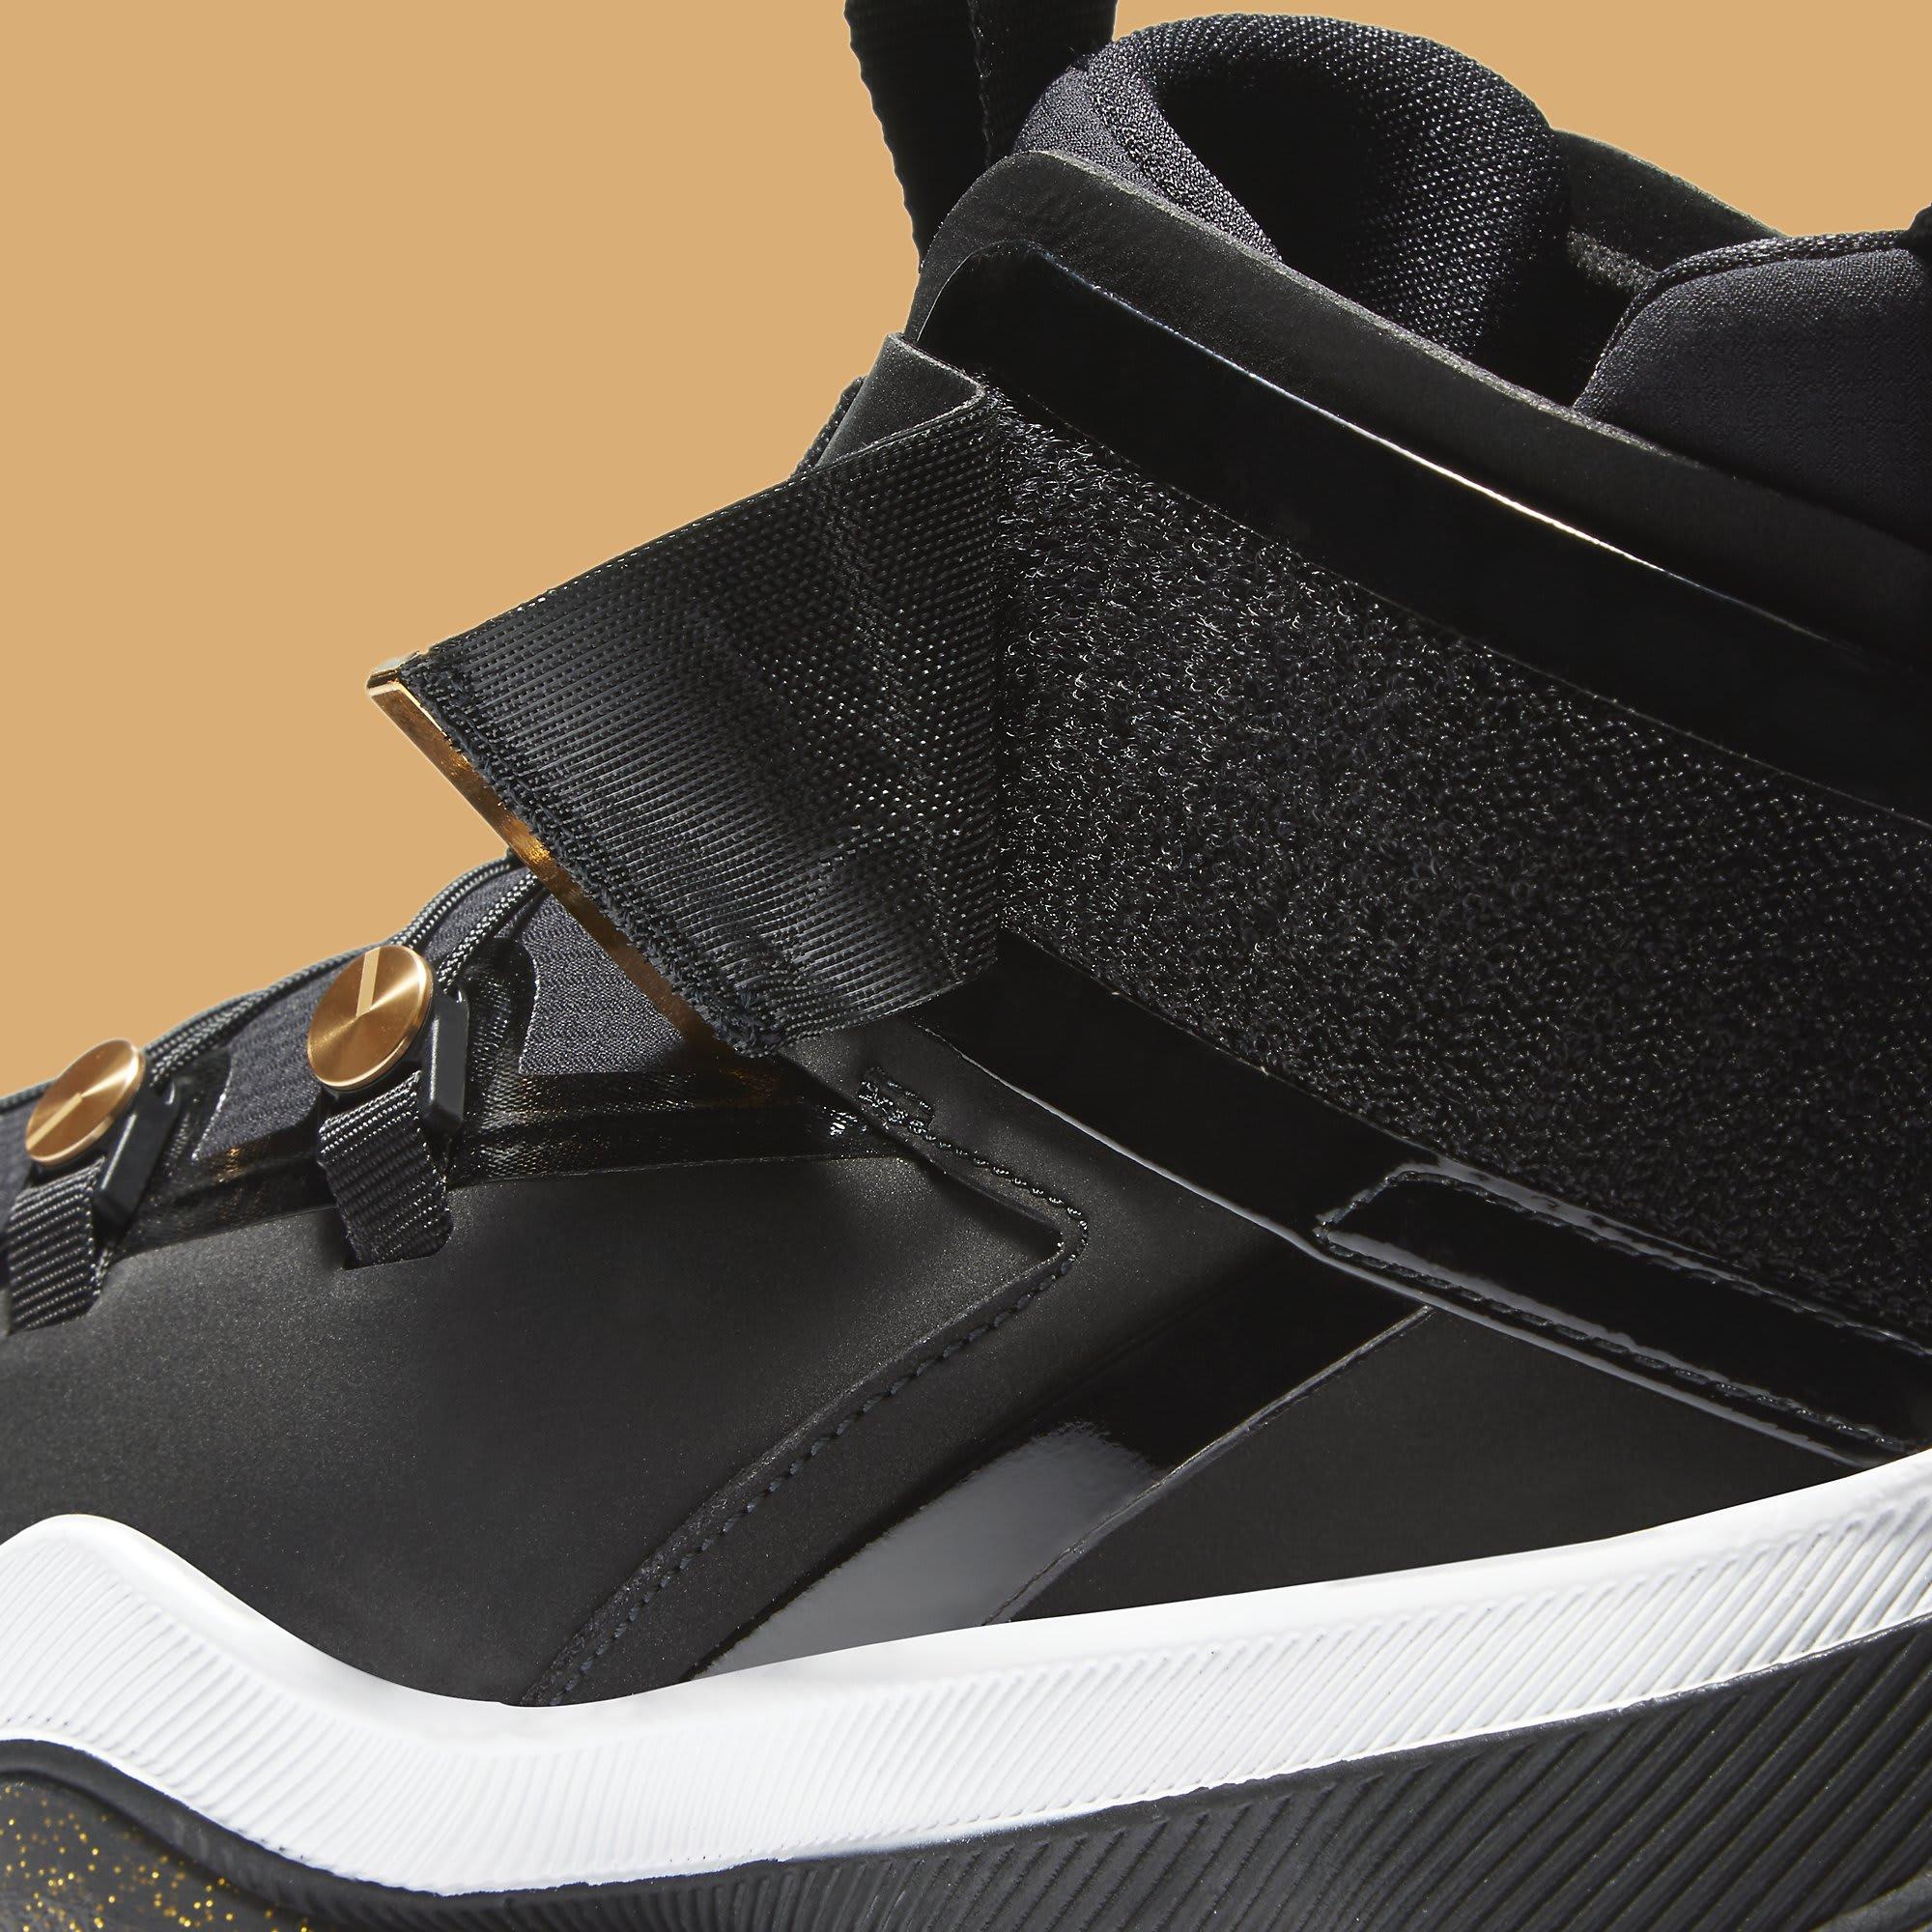 Jordan AJNT 23 Black Gold Release Date CI5441-008 Strap